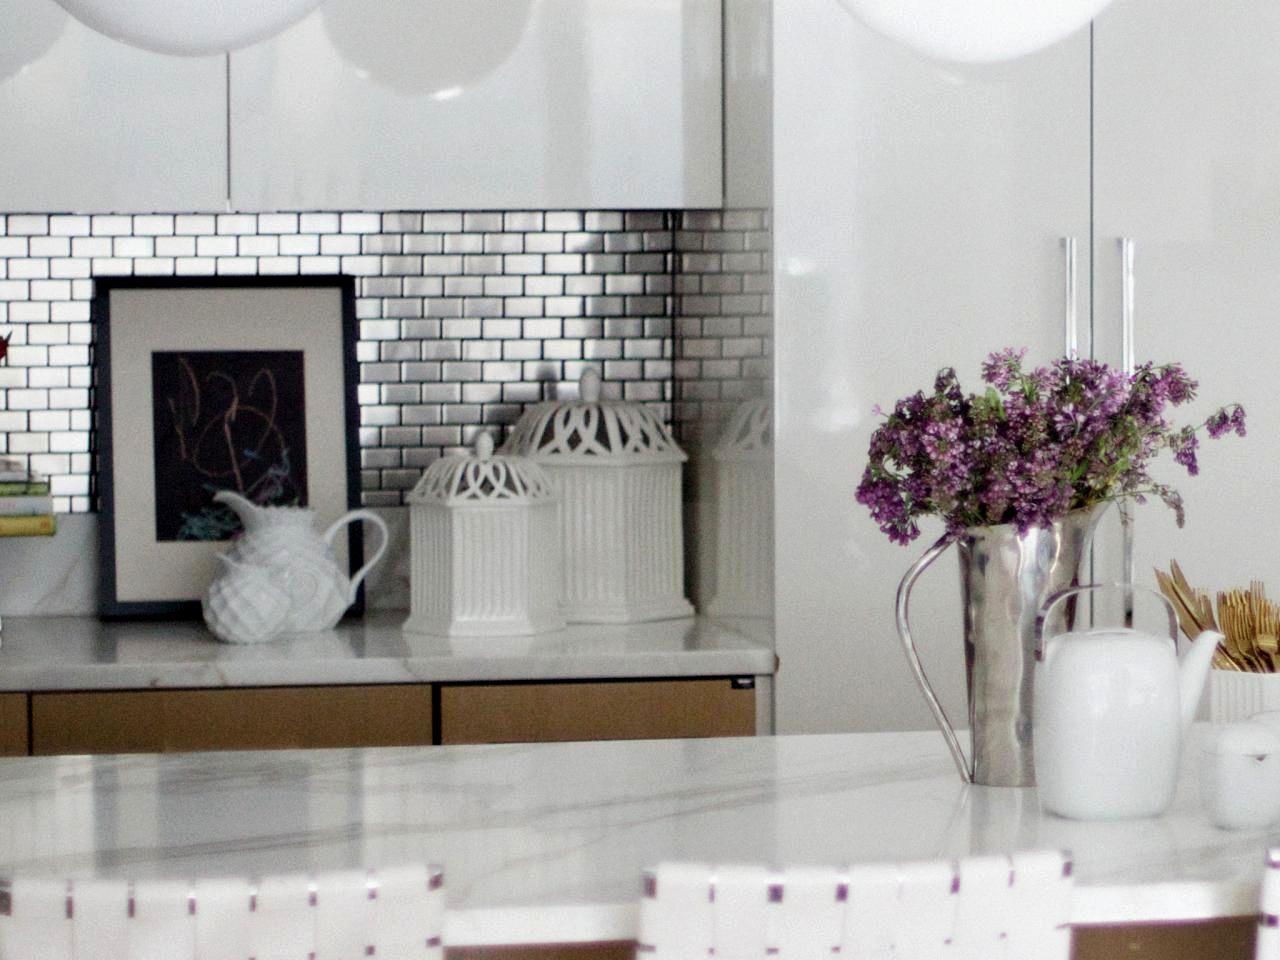 new tile backsplash bathroom image-Lovely Tile Backsplash Bathroom Gallery